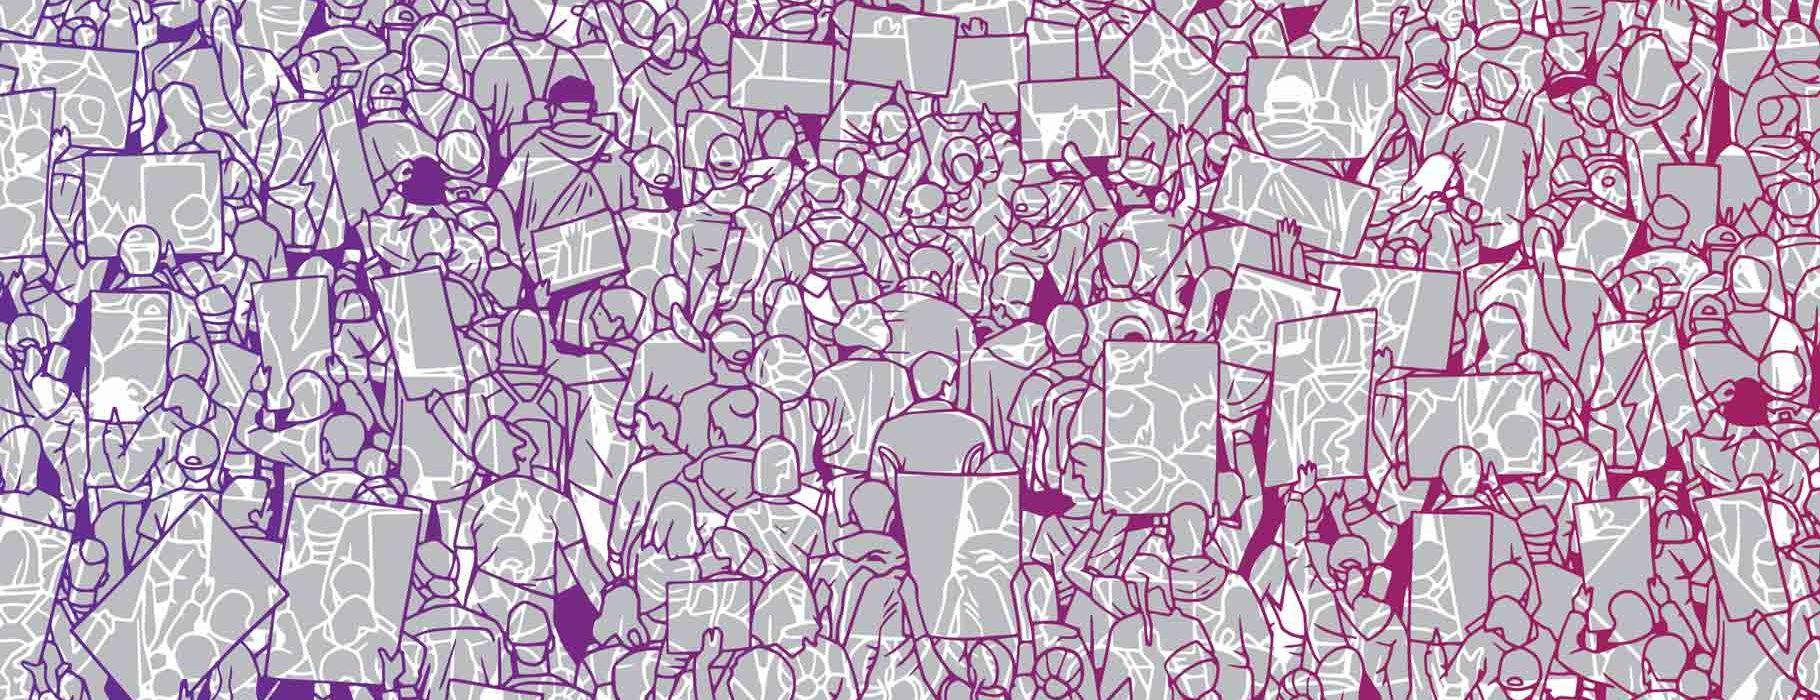 Line Art Illustration of a Mass Protest